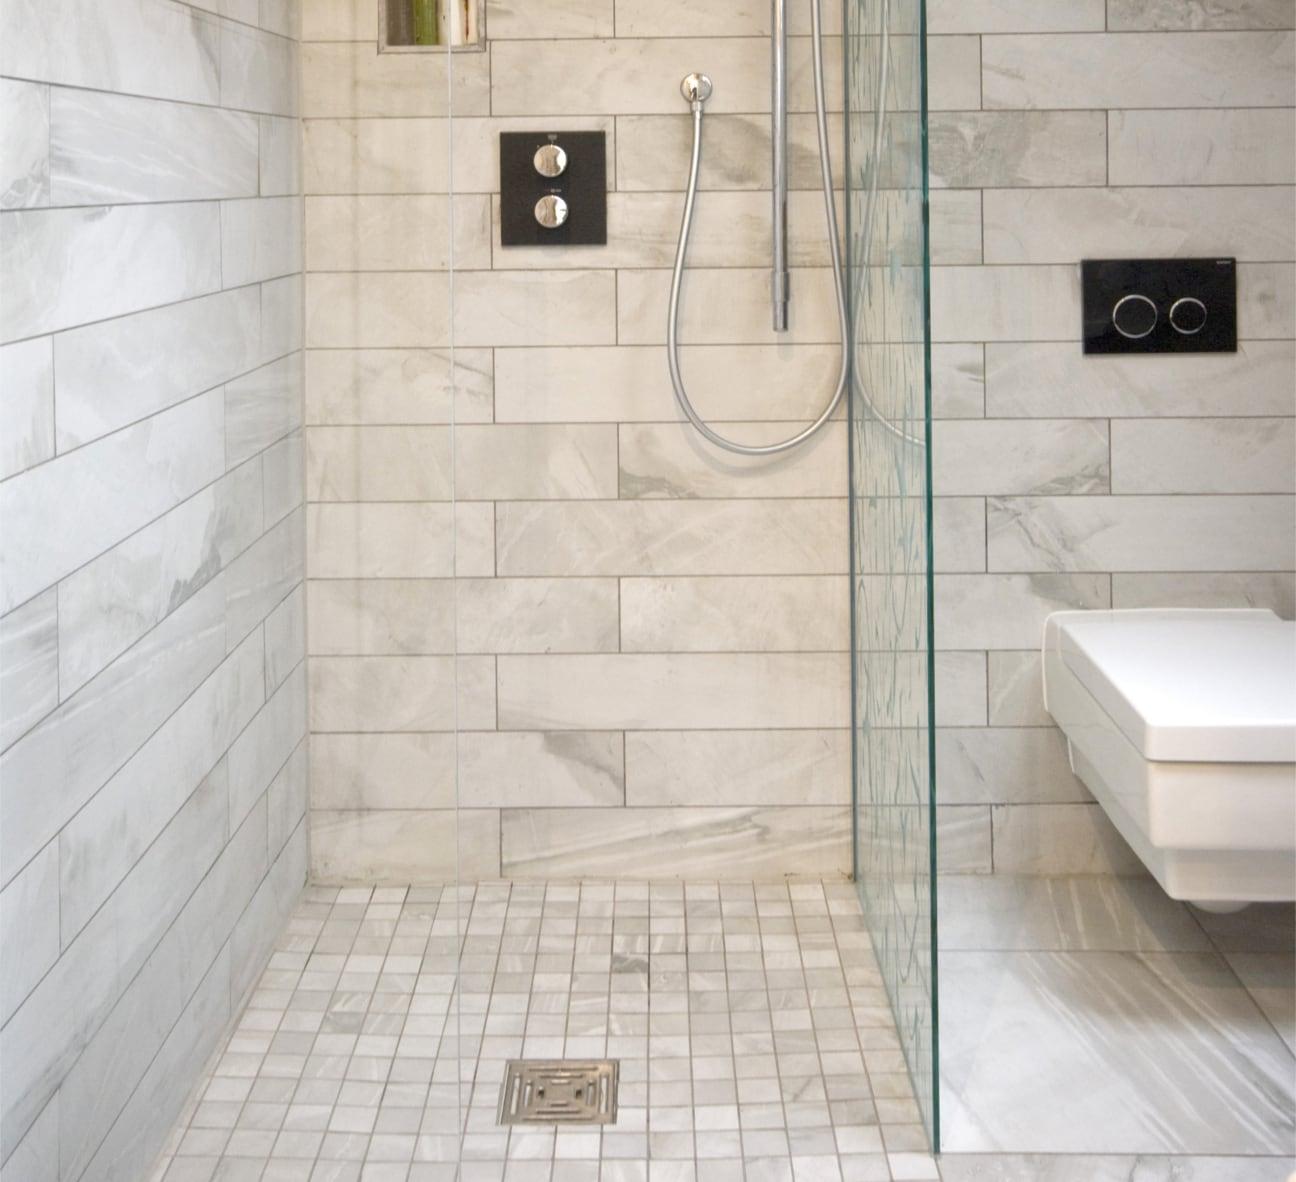 Vintage inspired diy bathroom remodel before and after for Bathroom tile inspiration pictures